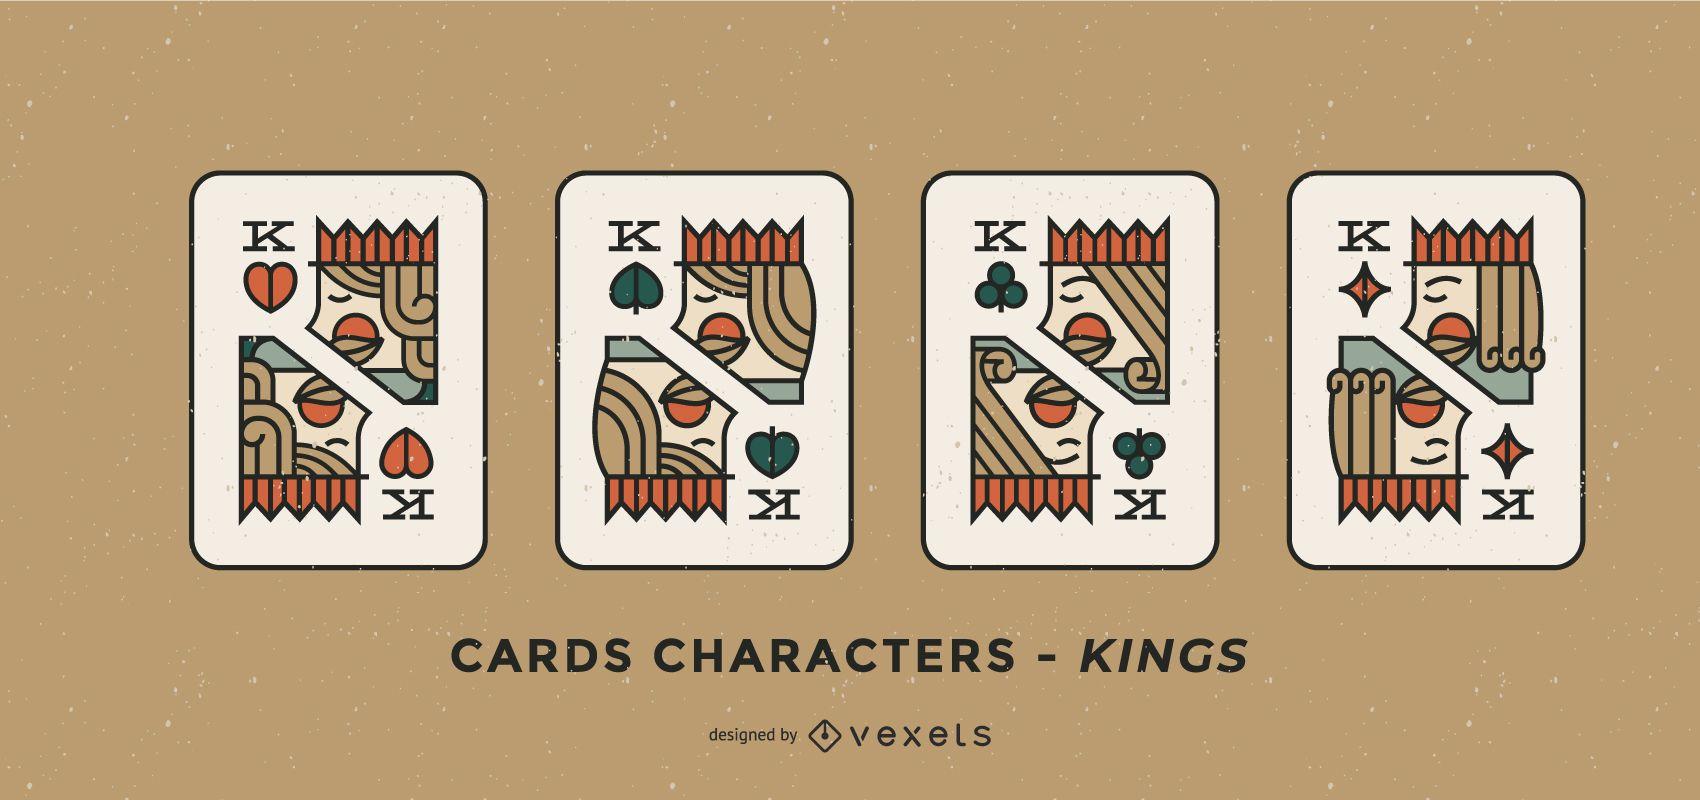 Poker Card Character Kings Set